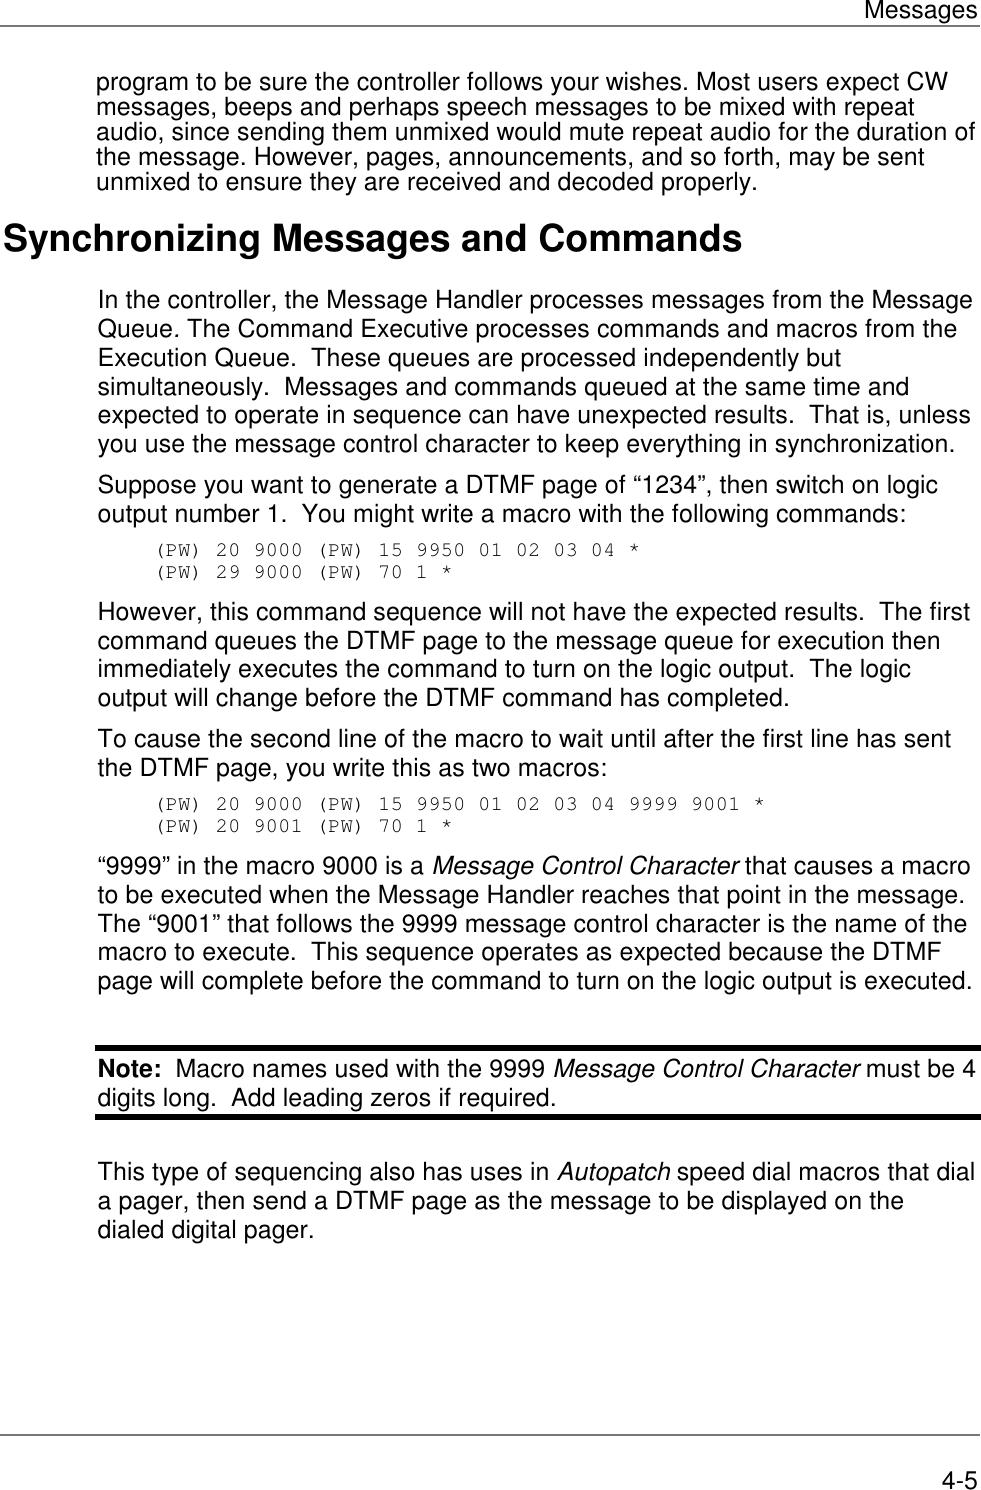 S COM 7K Owner's Manual Manual7k203i